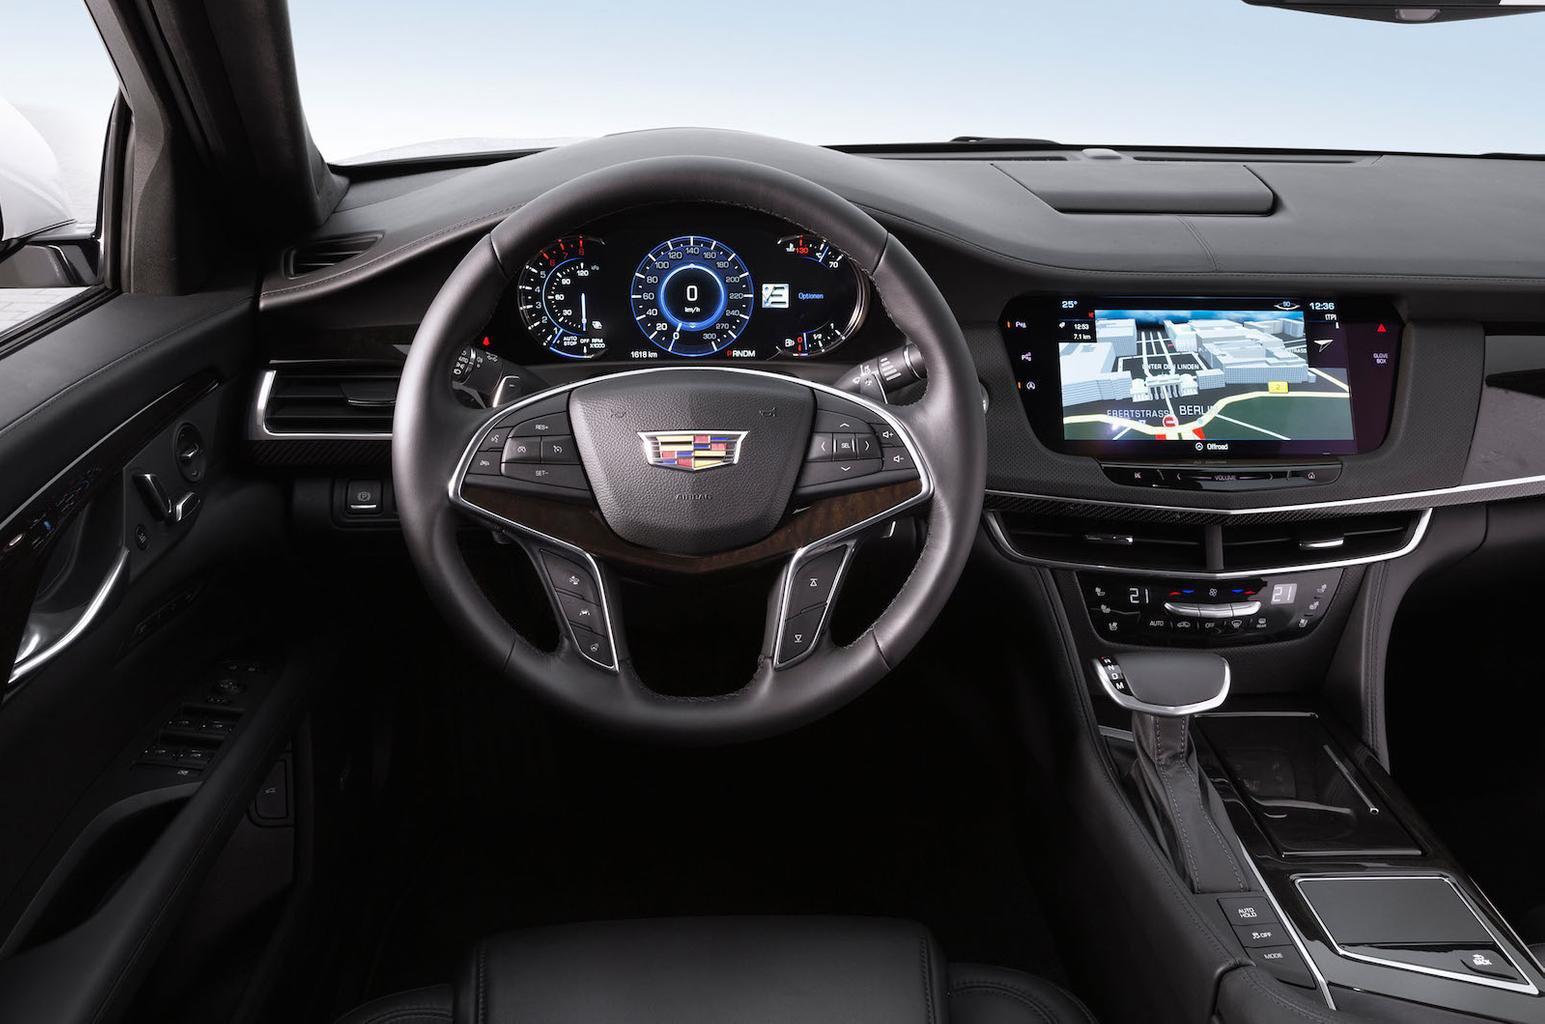 2016 Cadillac CT6 Platinum review